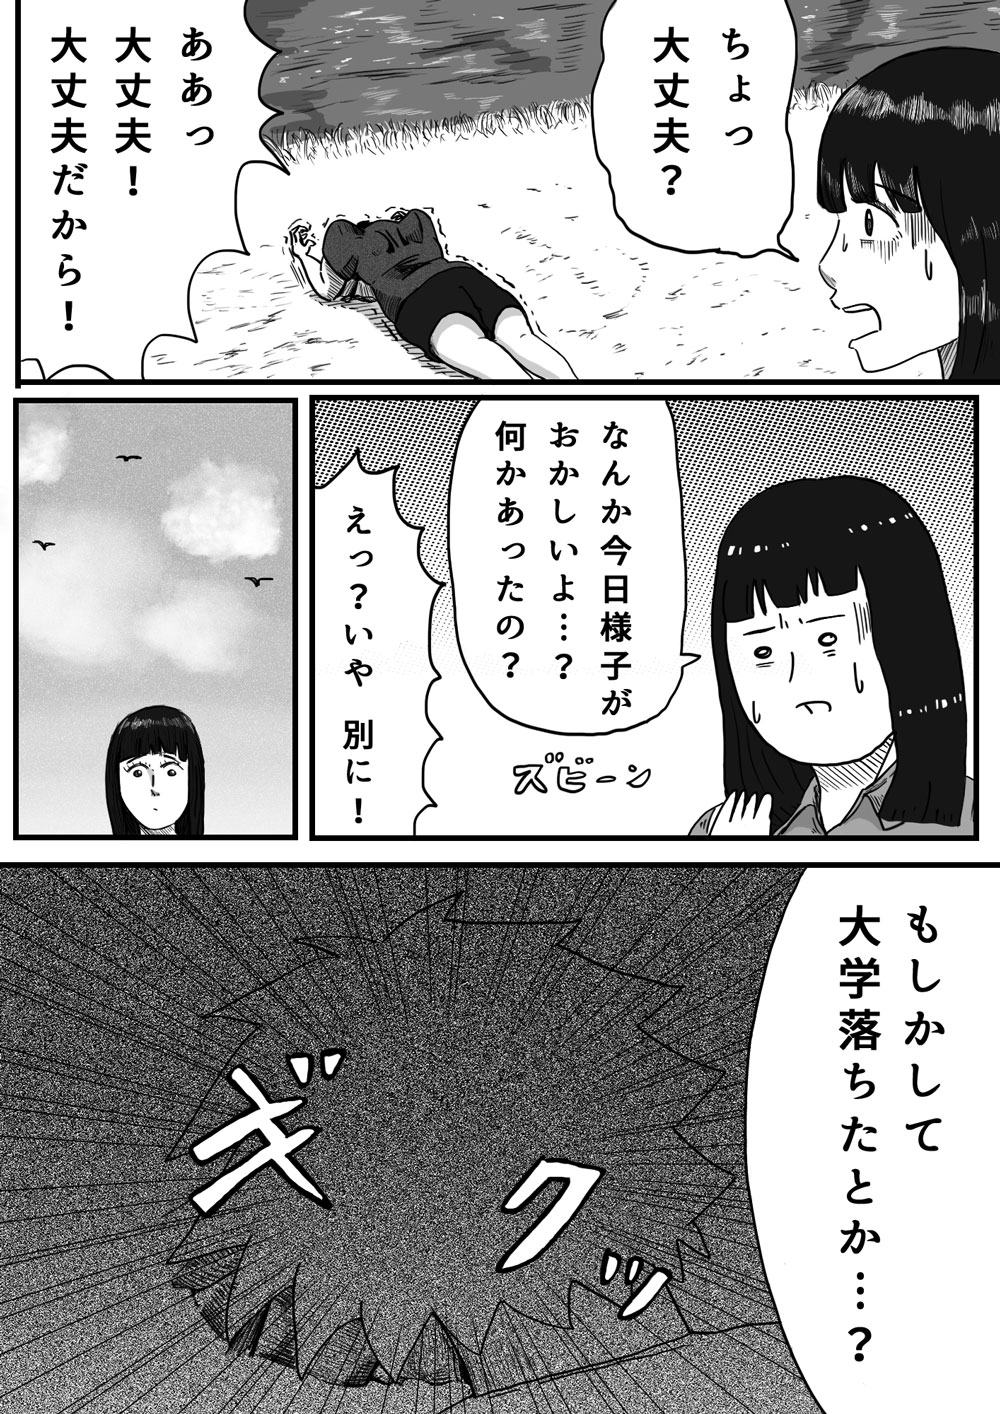 arnolds-hasegawa-006-2